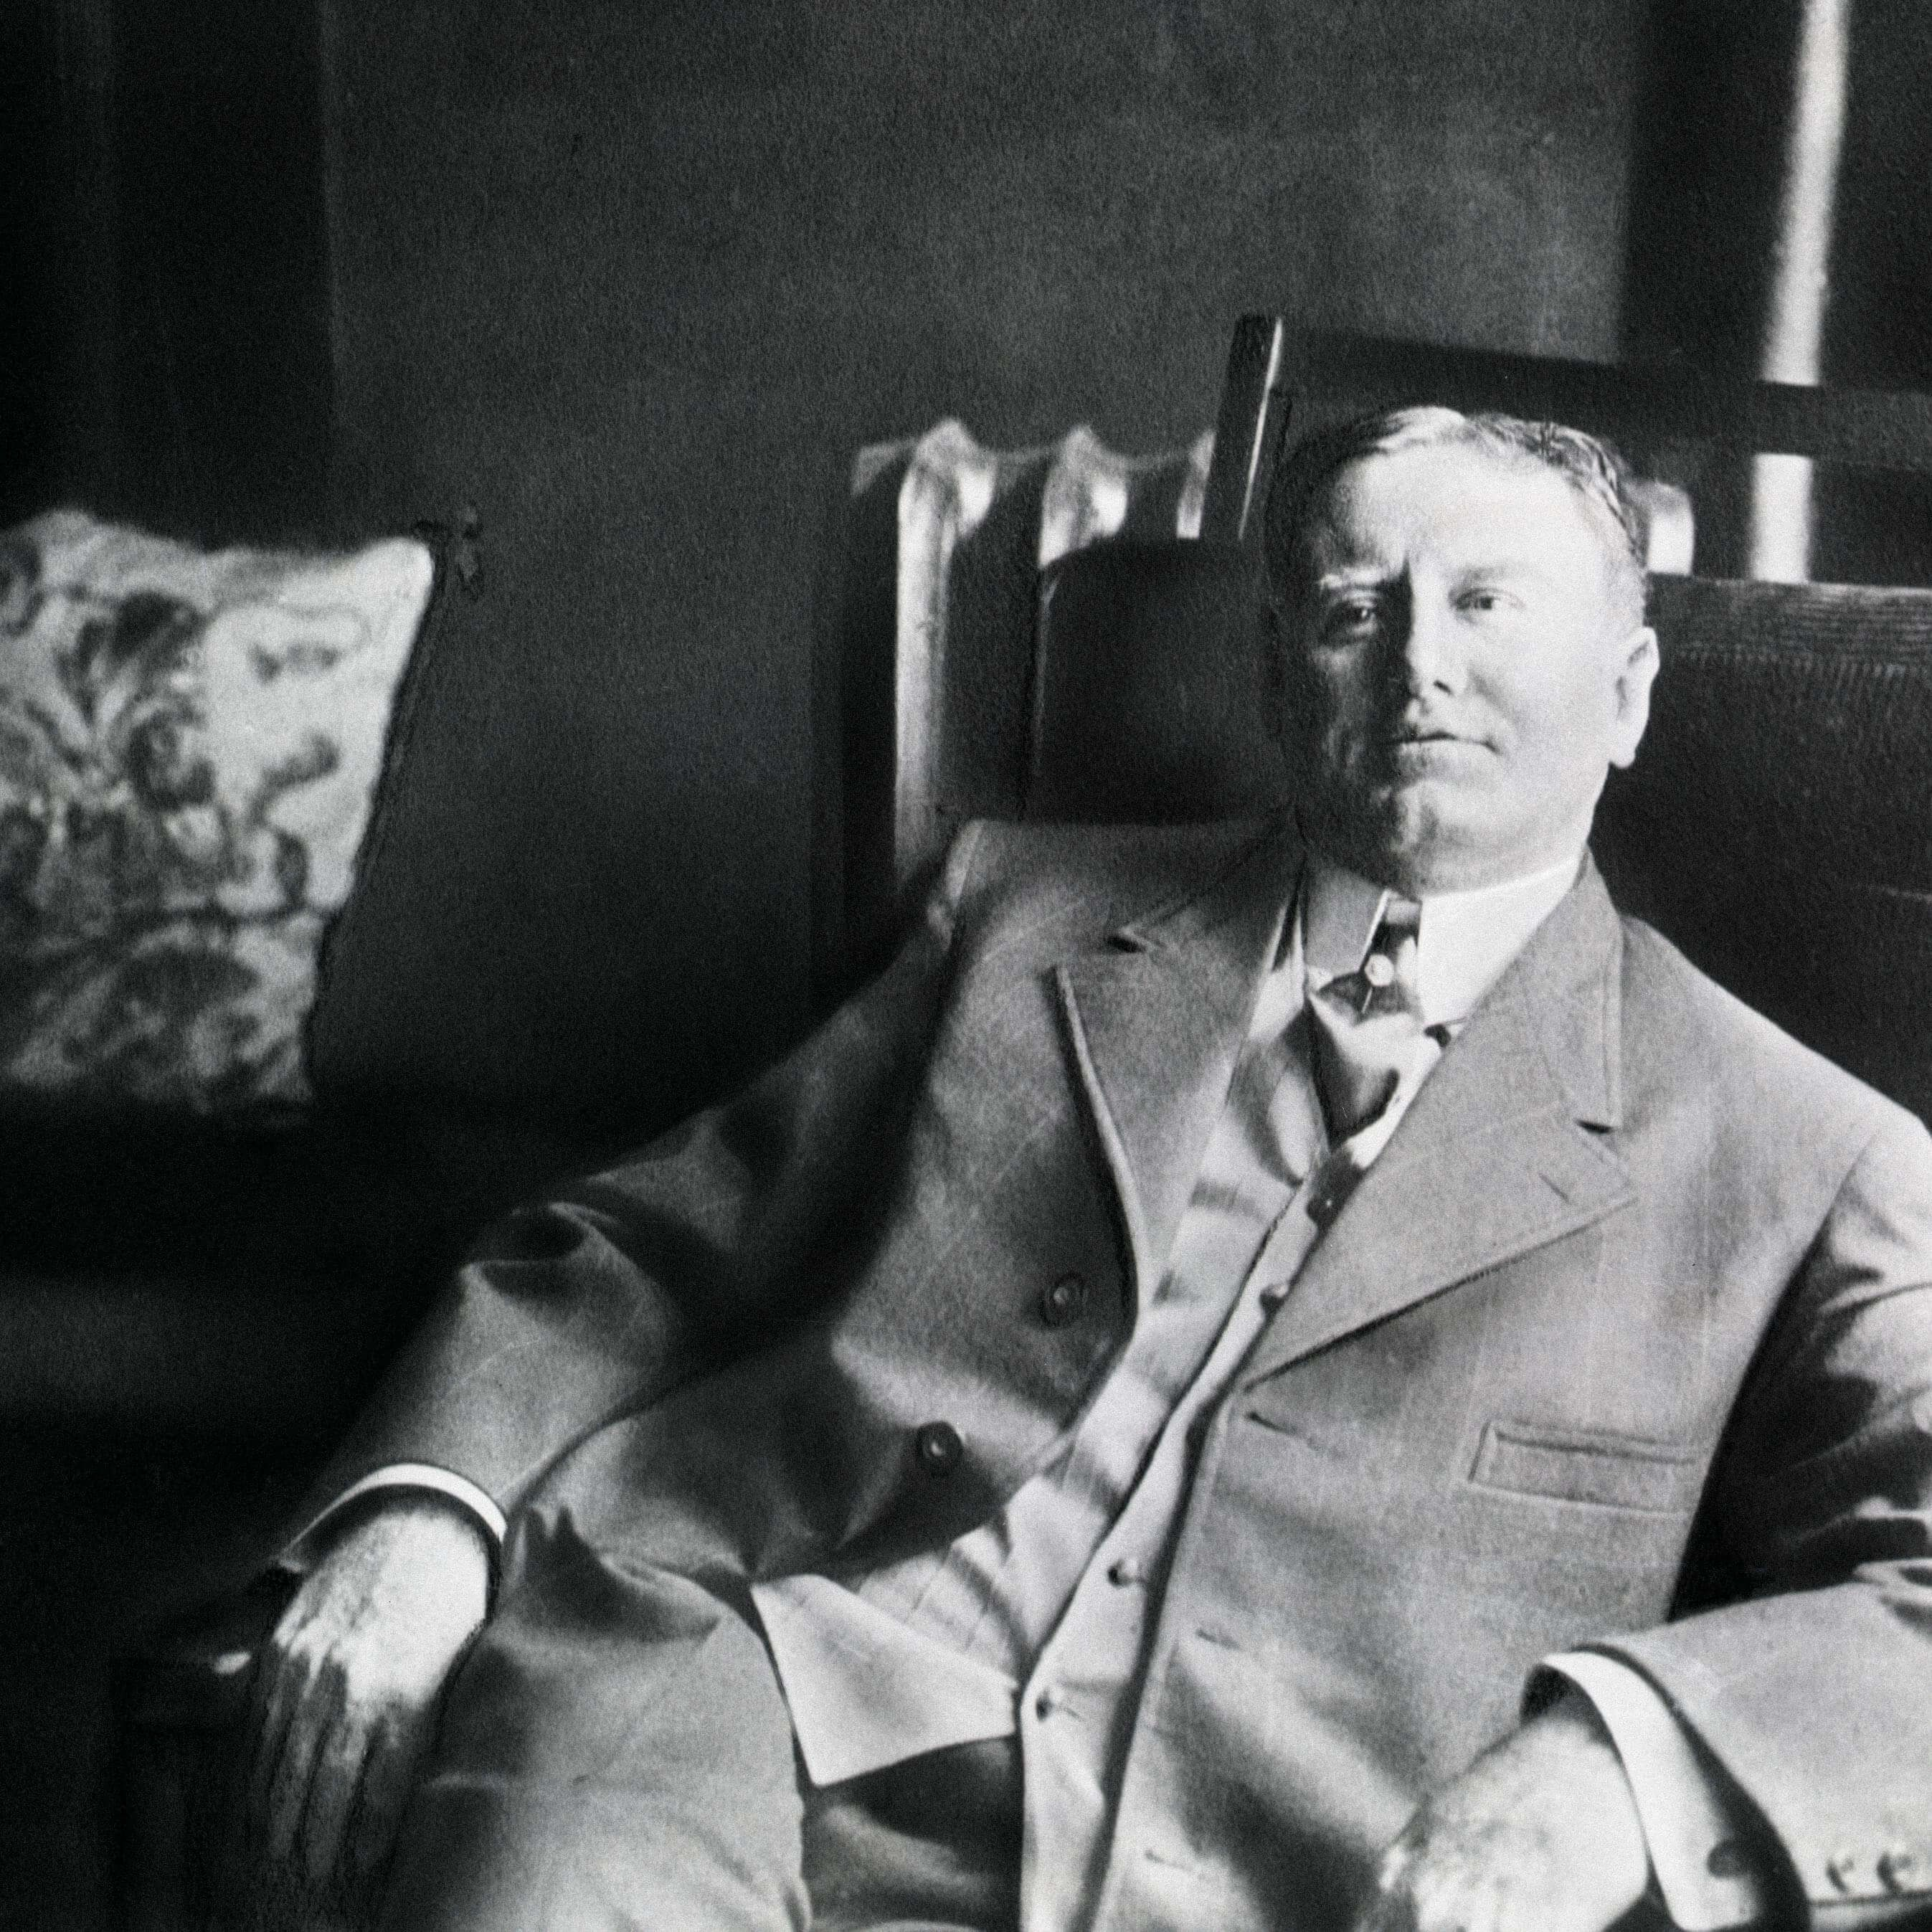 Уильям Портер, взявший псевдоним О. Генри. Источник: Bettmann Archive / Getty Images